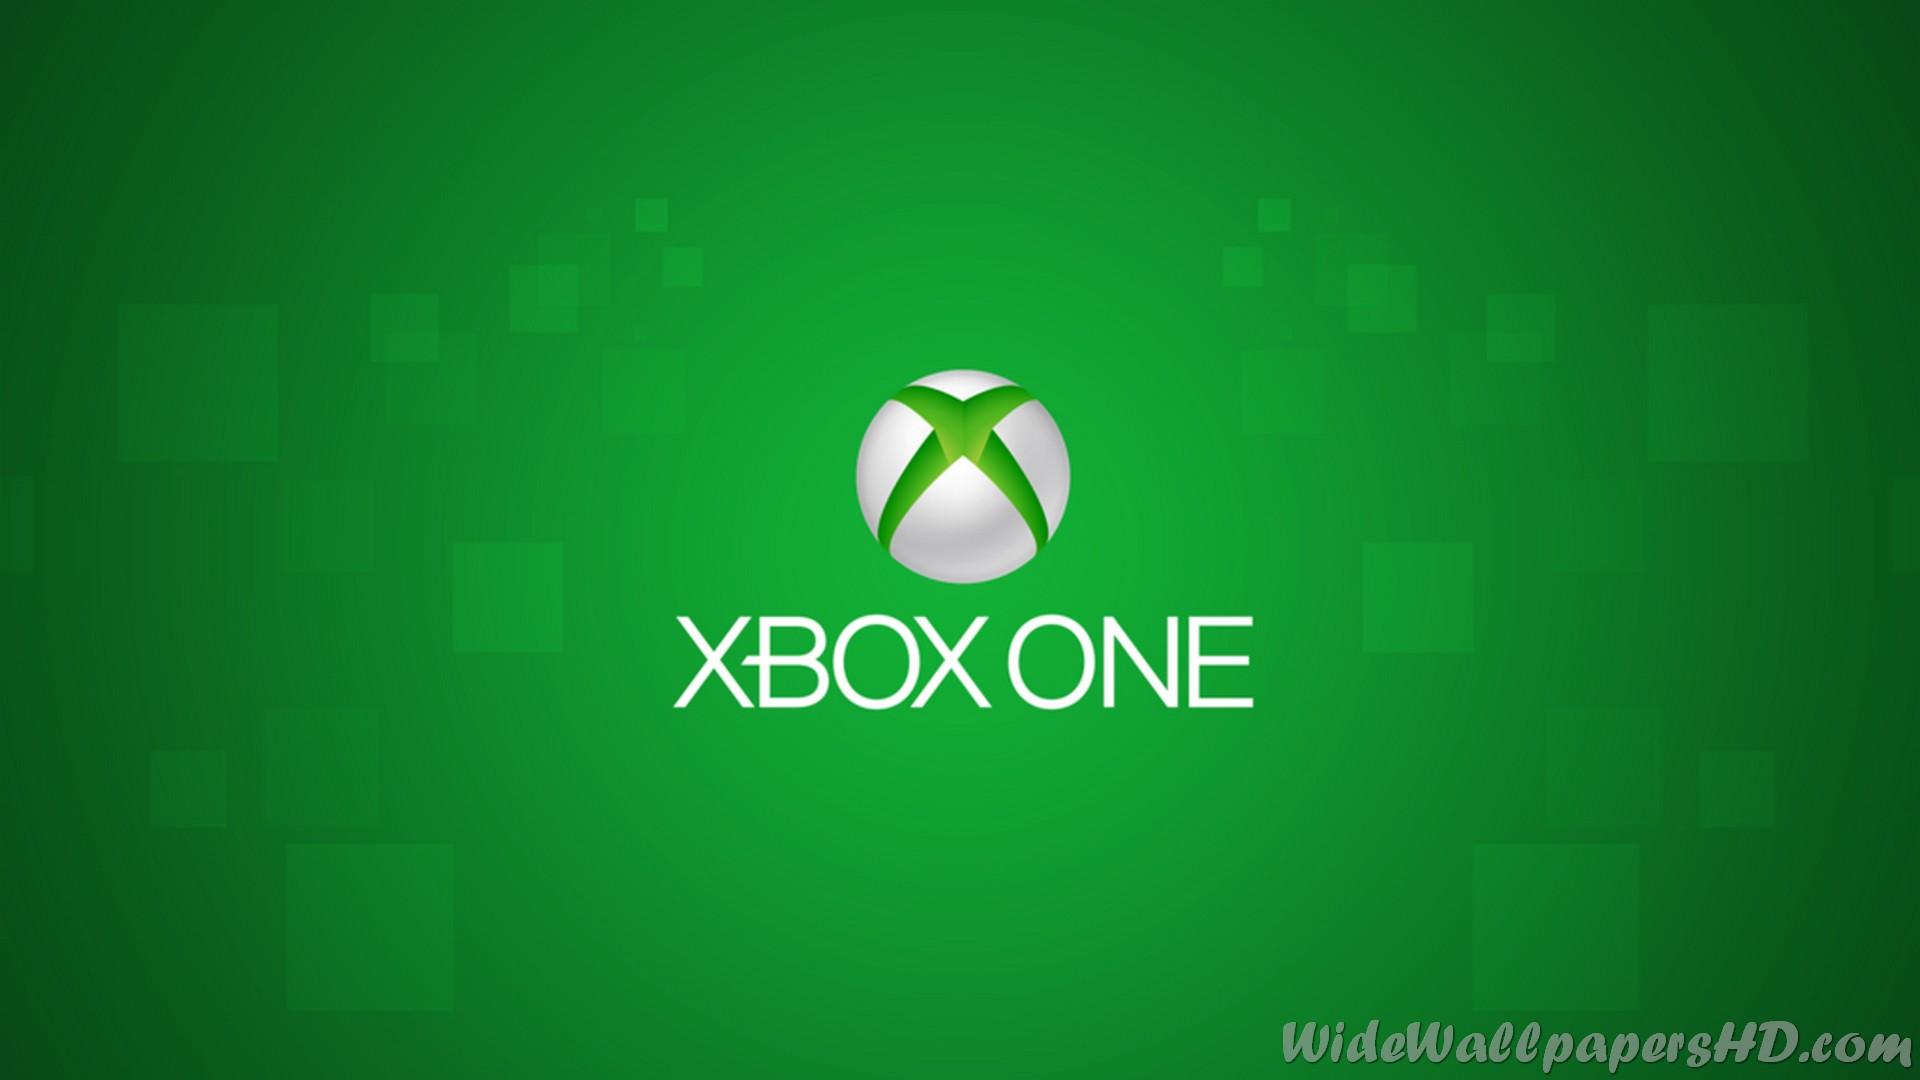 Xbox Hd Wallpapers Wallpapersafari